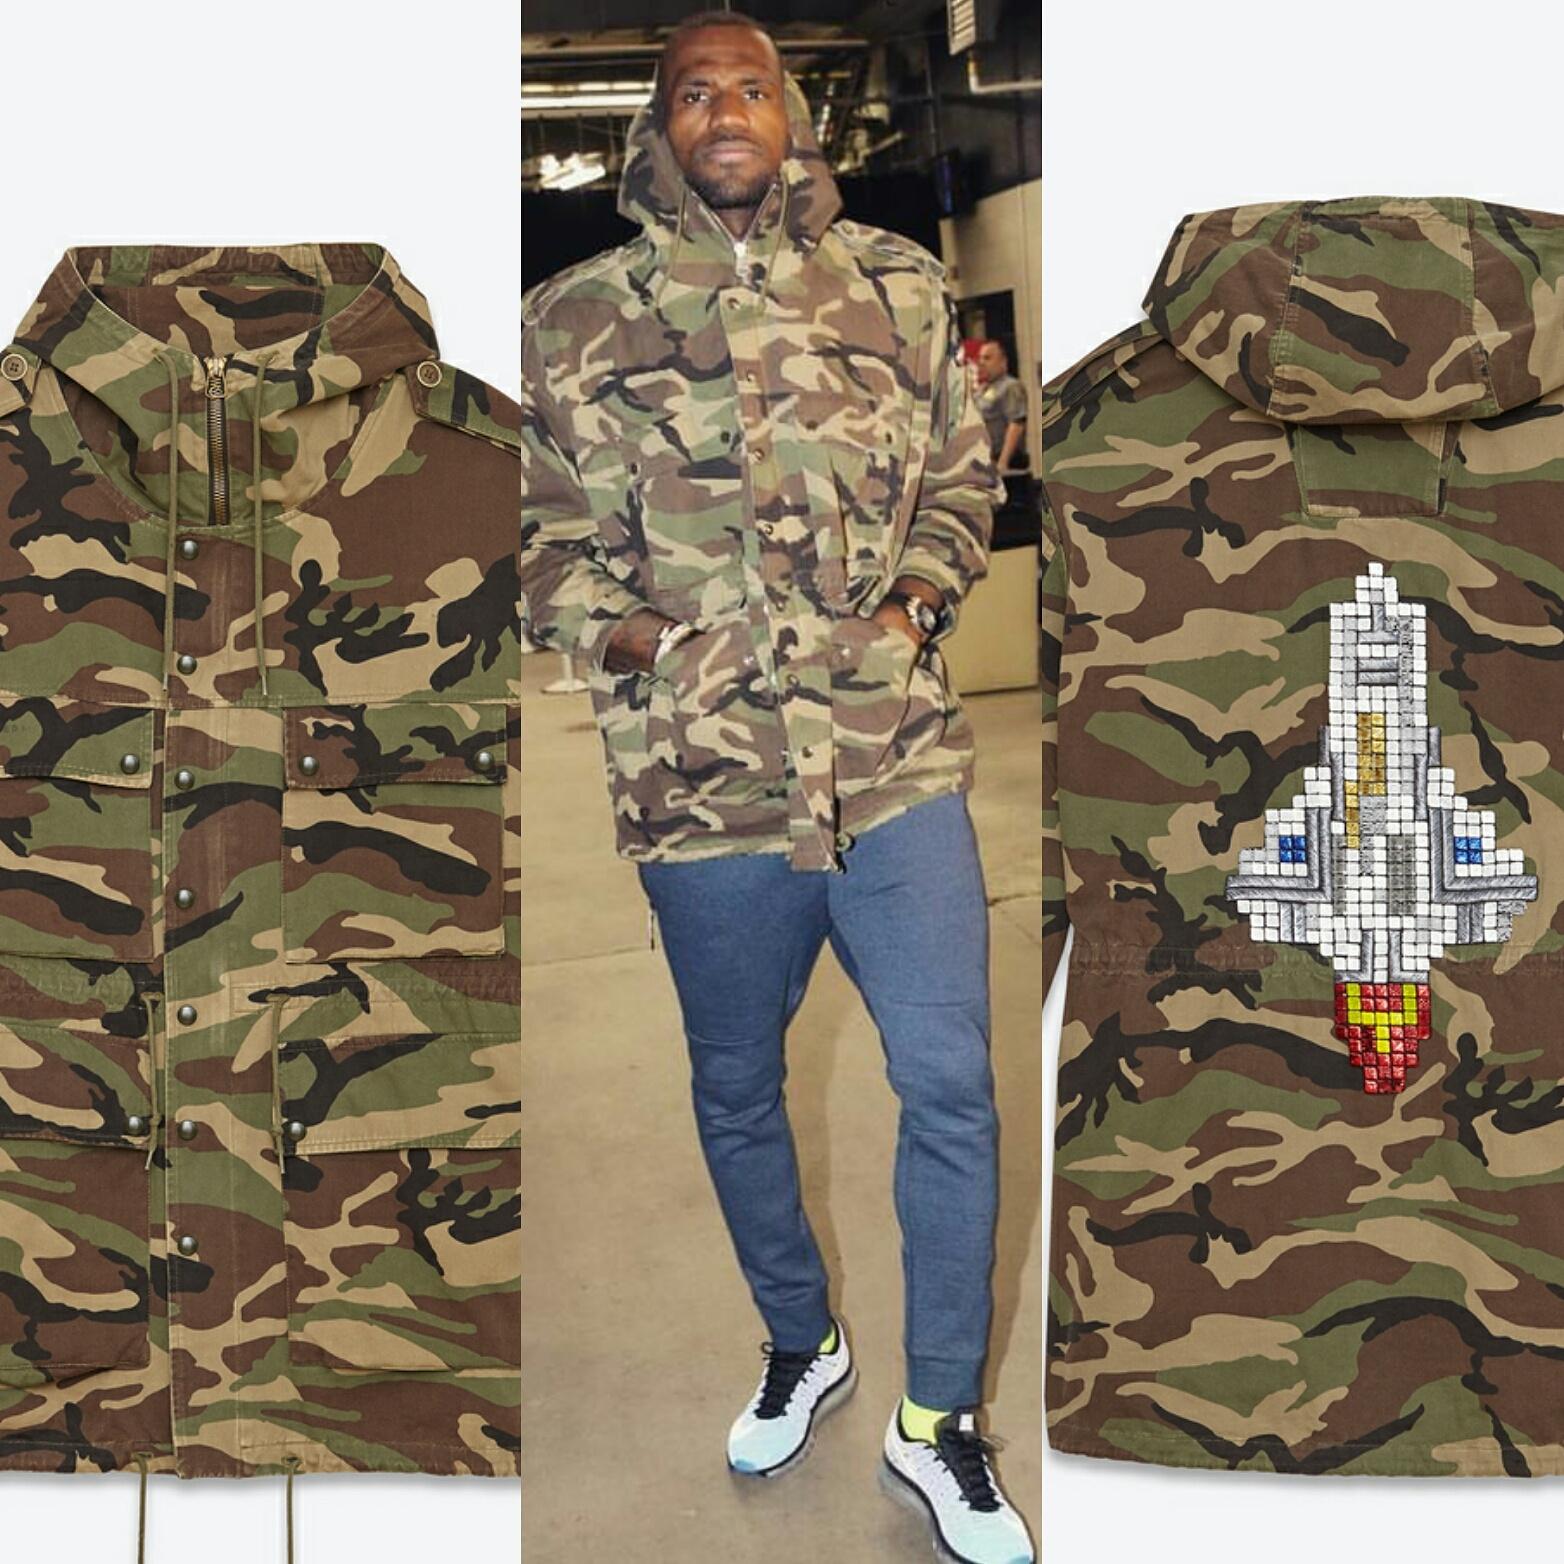 STYLE: Lebron James' Saint Laurent Embellished Camouflage Parka